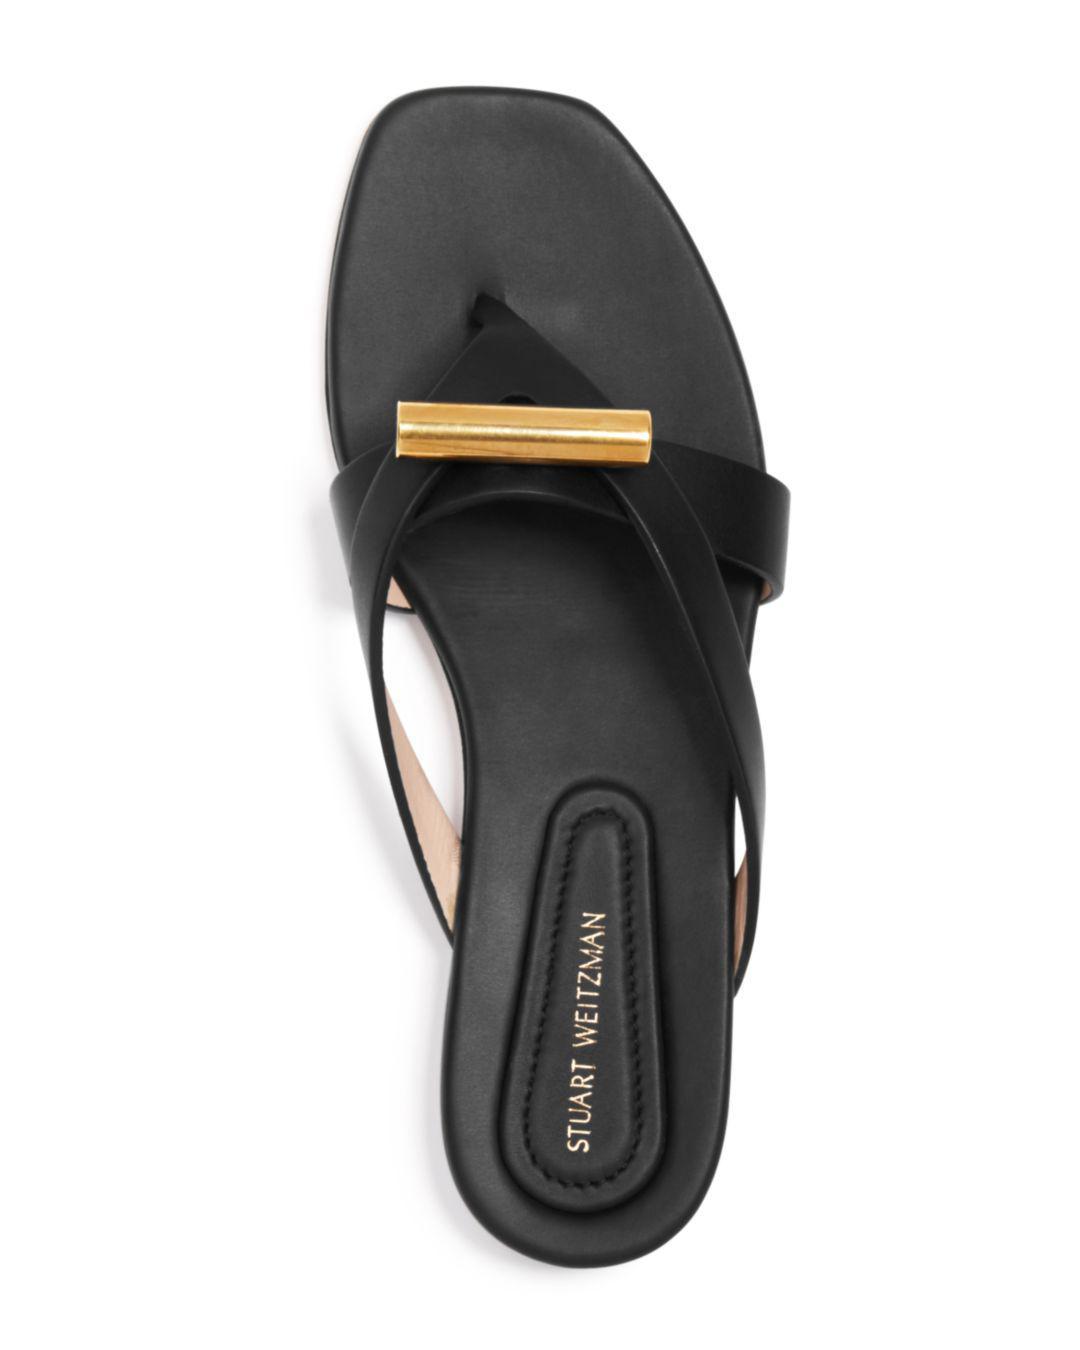 486040a1f47 Stuart Weitzman Arro Flat Thong Slide Sandals in Black - Lyst